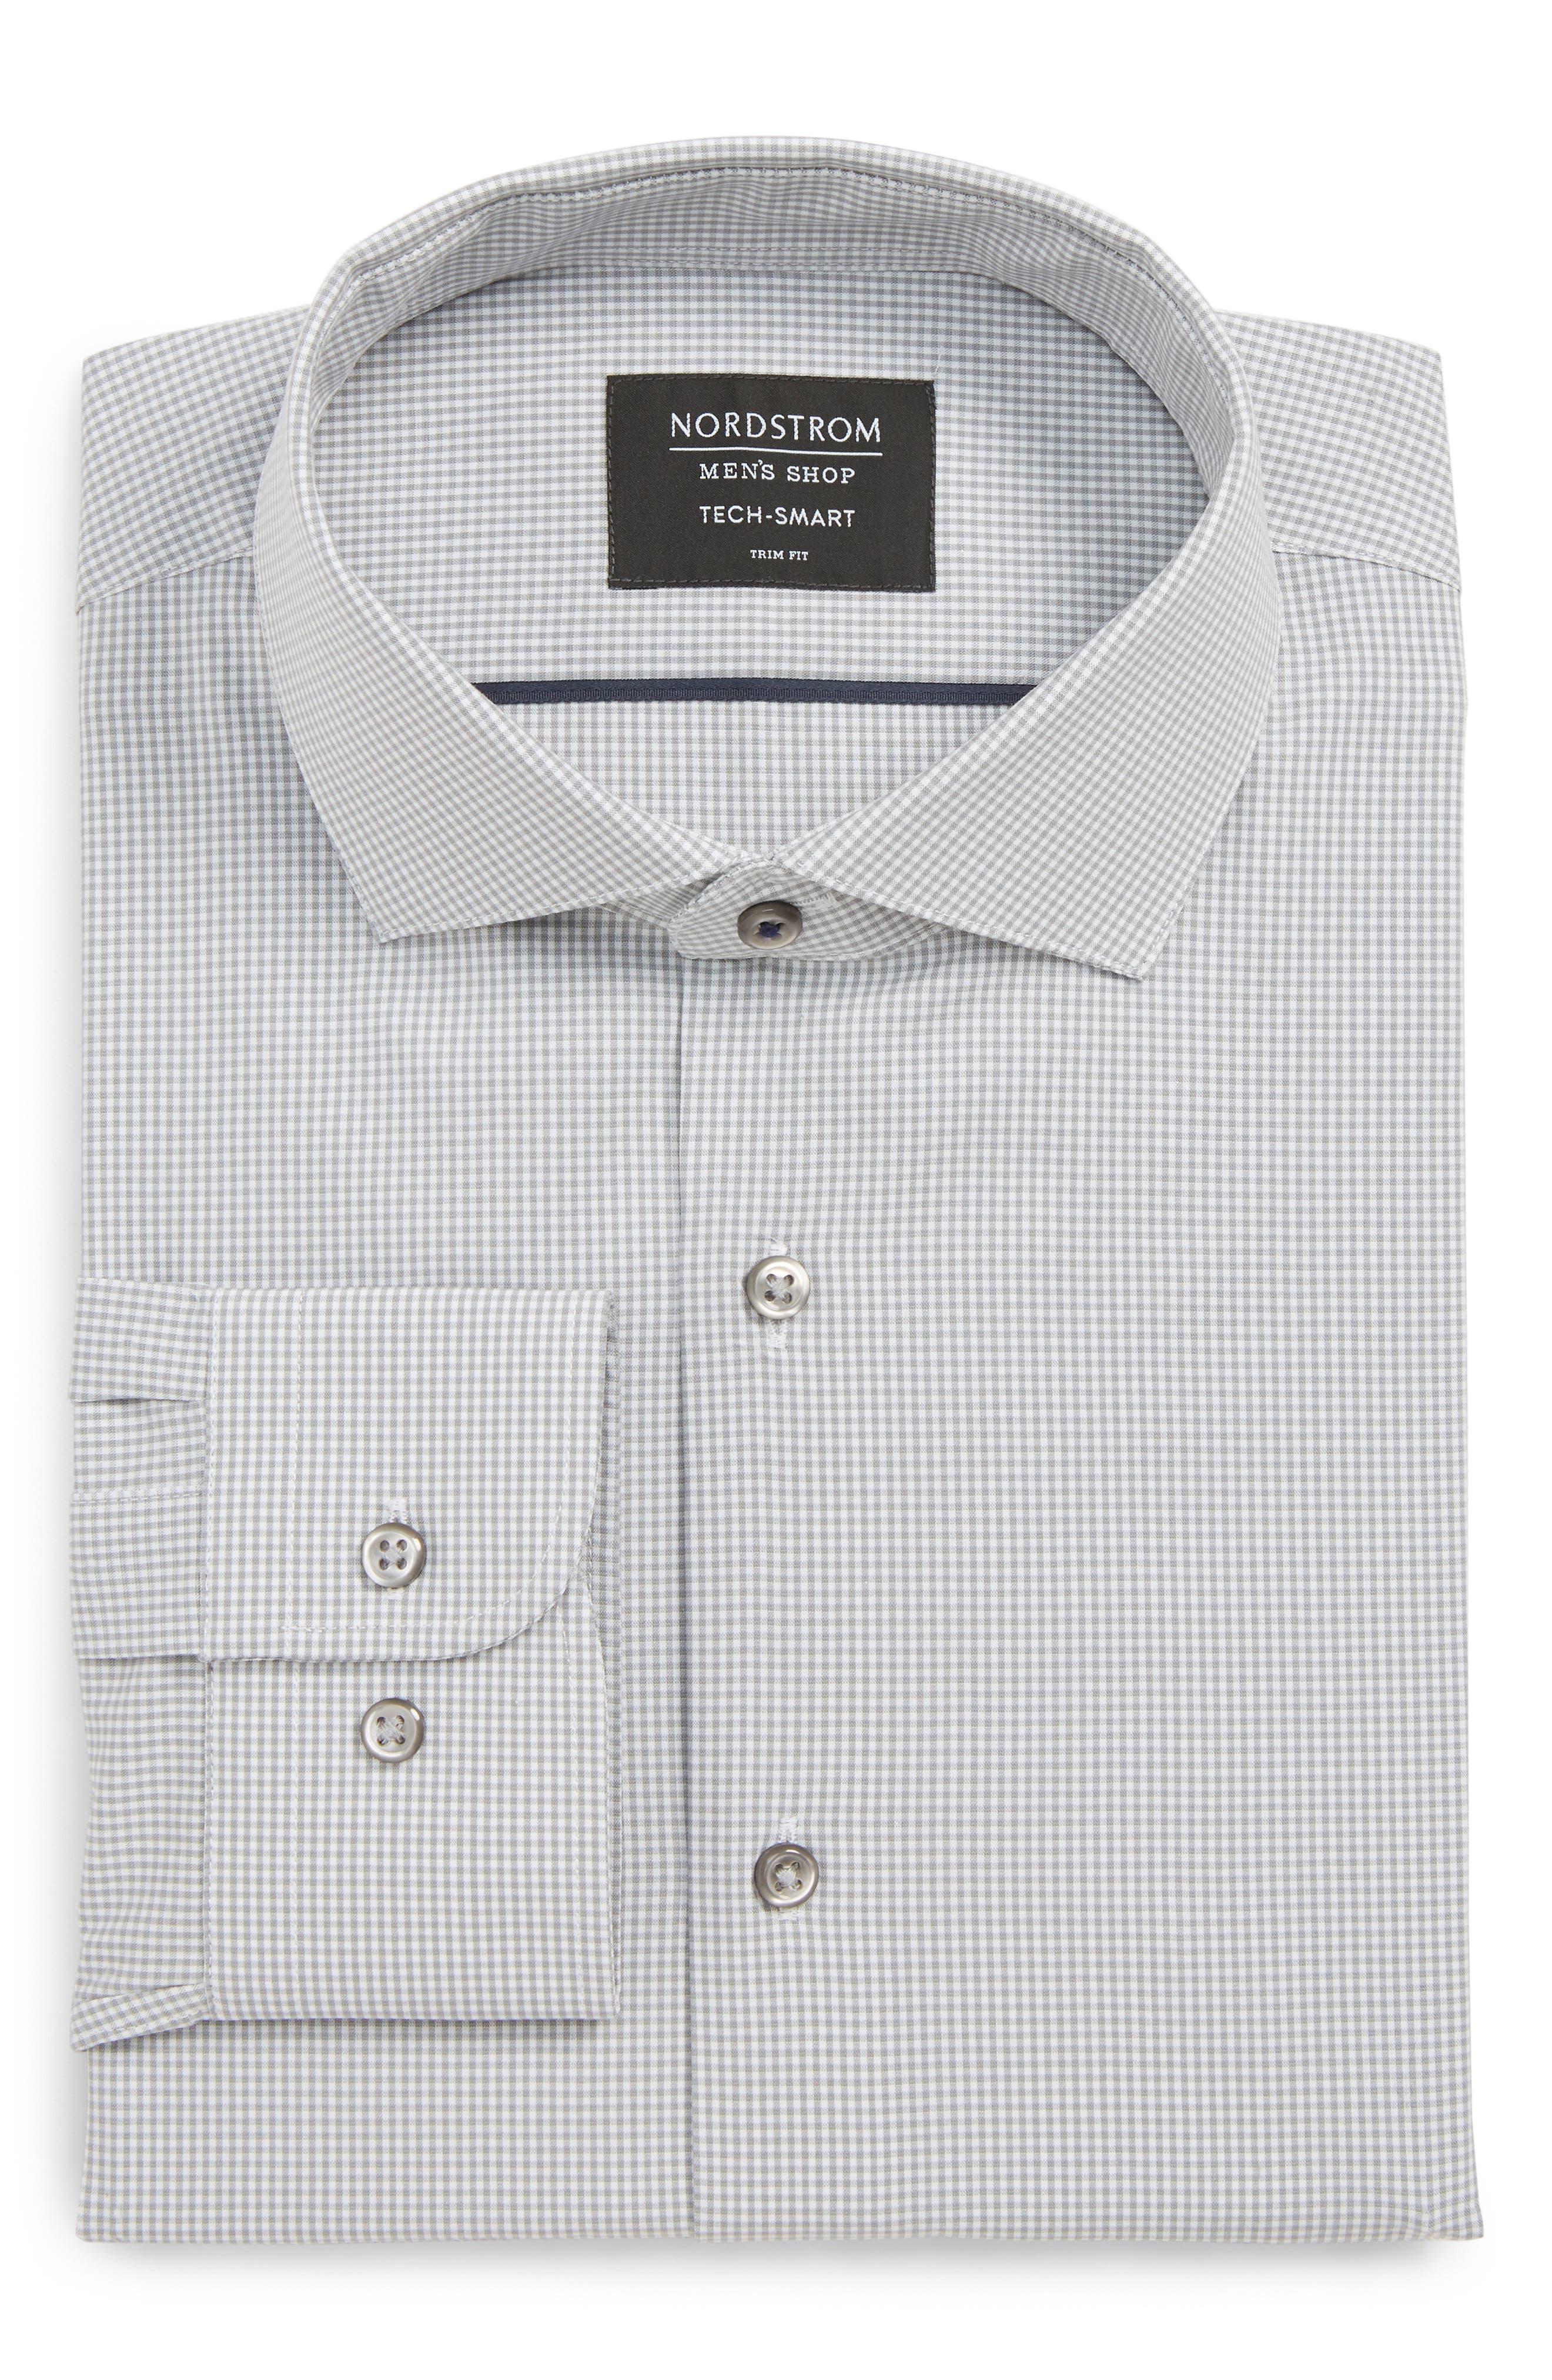 Tech-Smart Trim Fit Stretch Check Dress Shirt,                         Main,                         color, GREY SLEET